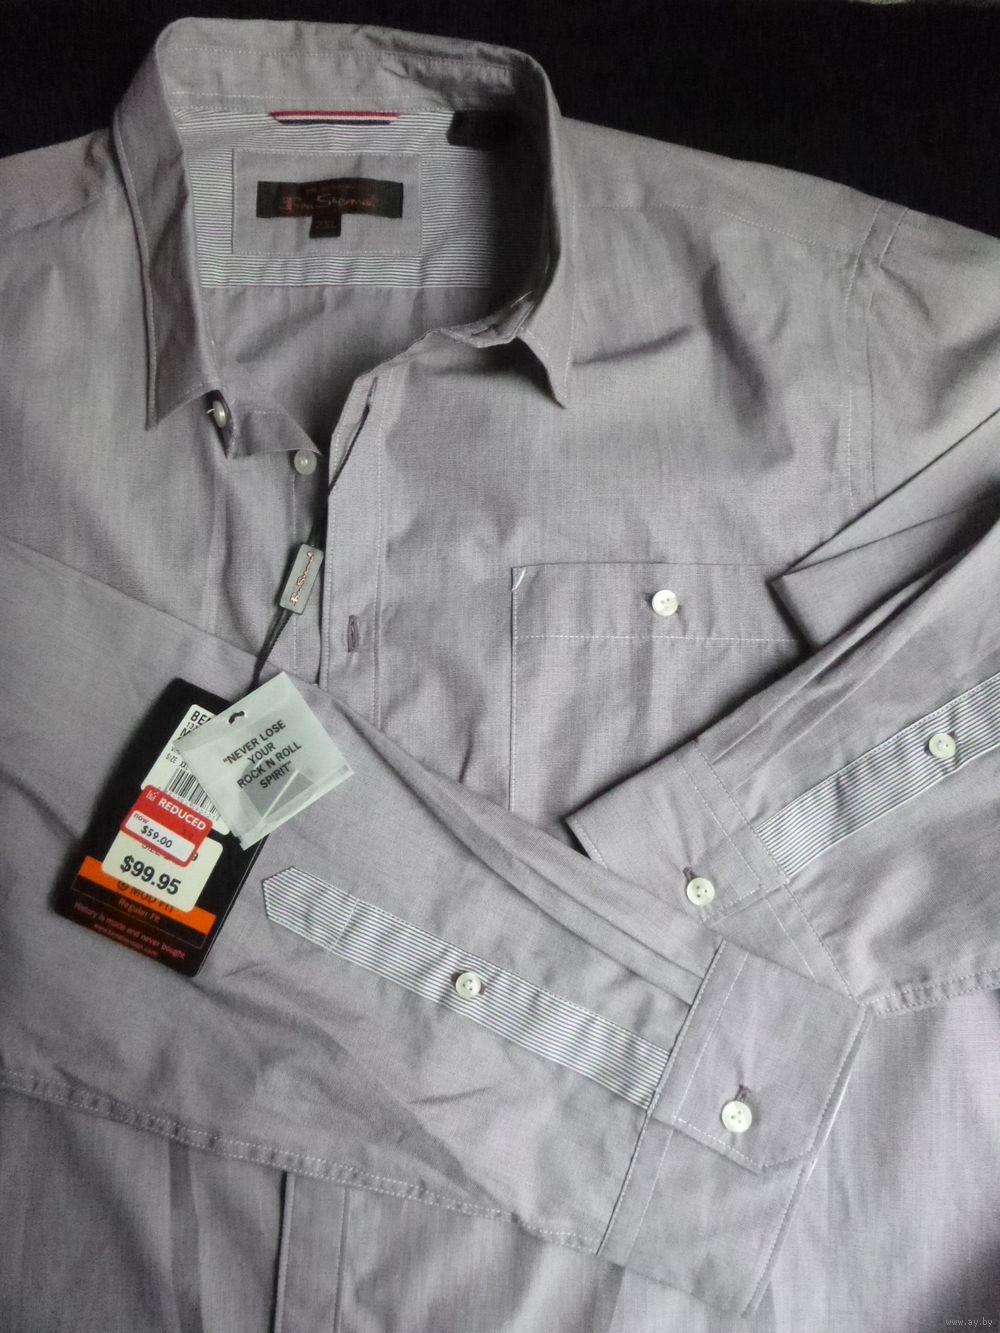 9858514f300 Рубашка мужская (новая) Ben Sherman